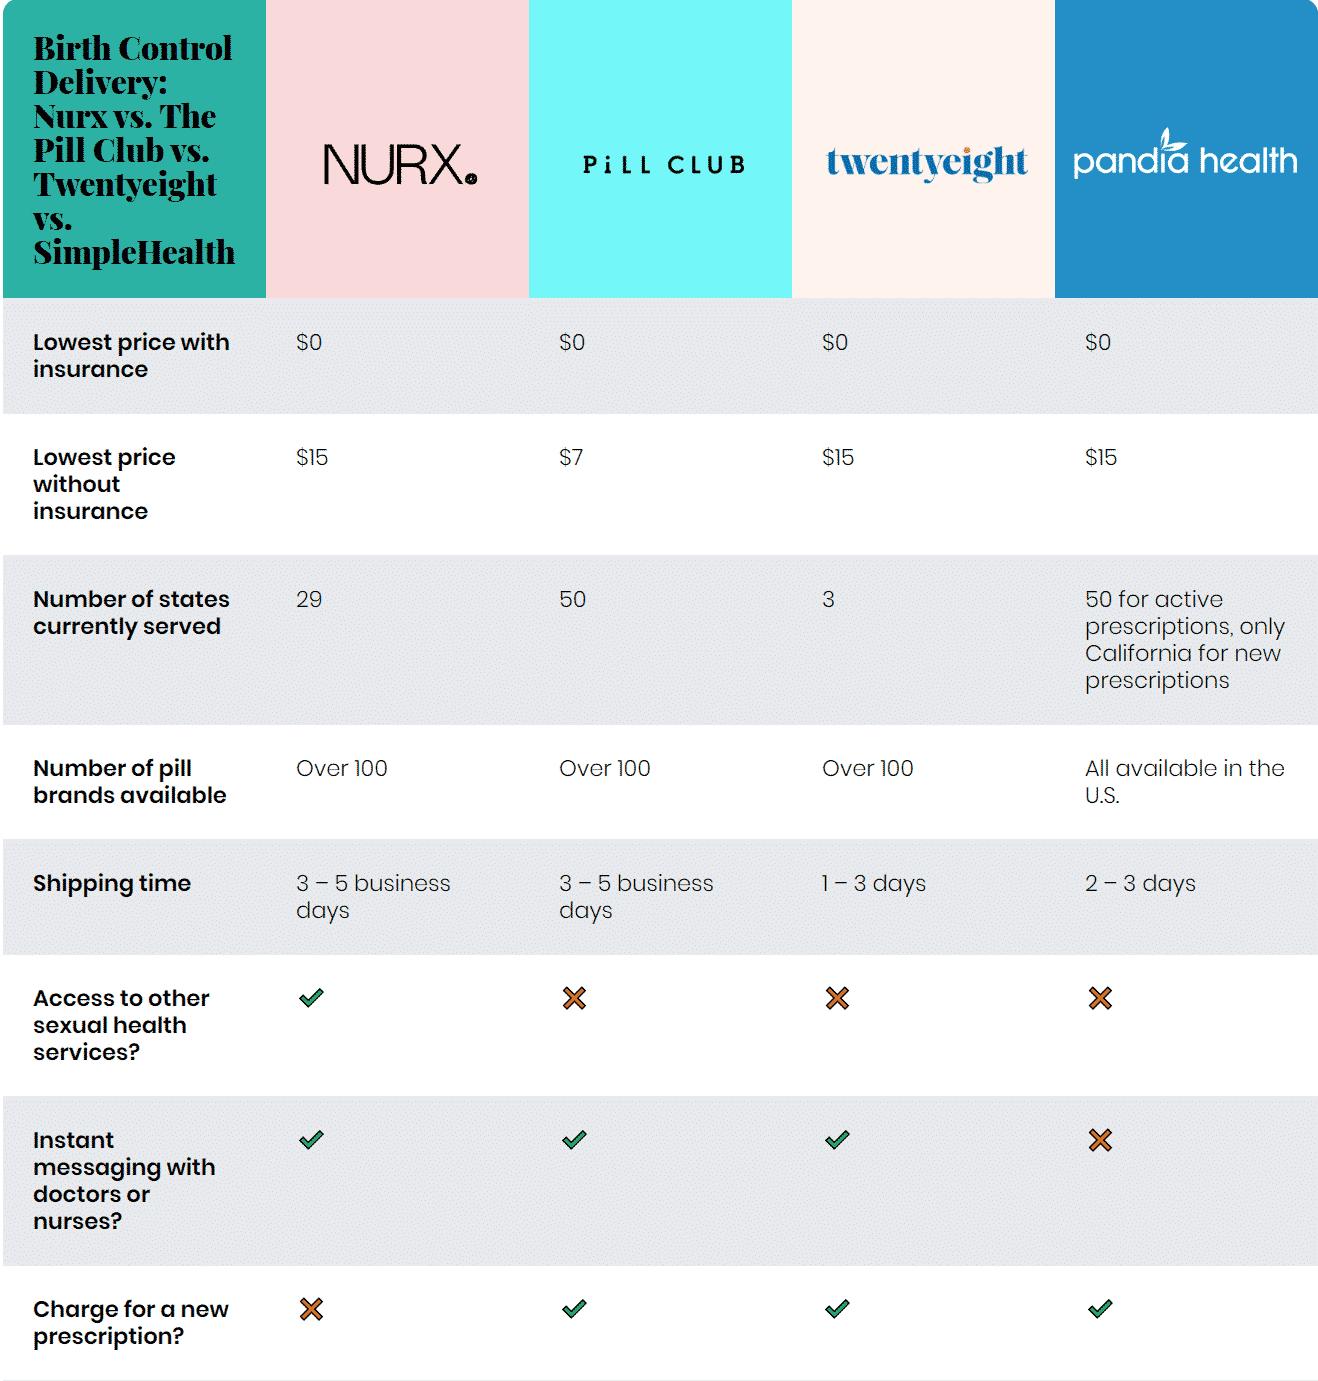 Birth Control Delivery: Nurx vs. The Pill Club vs. Twentyeight vs. SimpleHealth